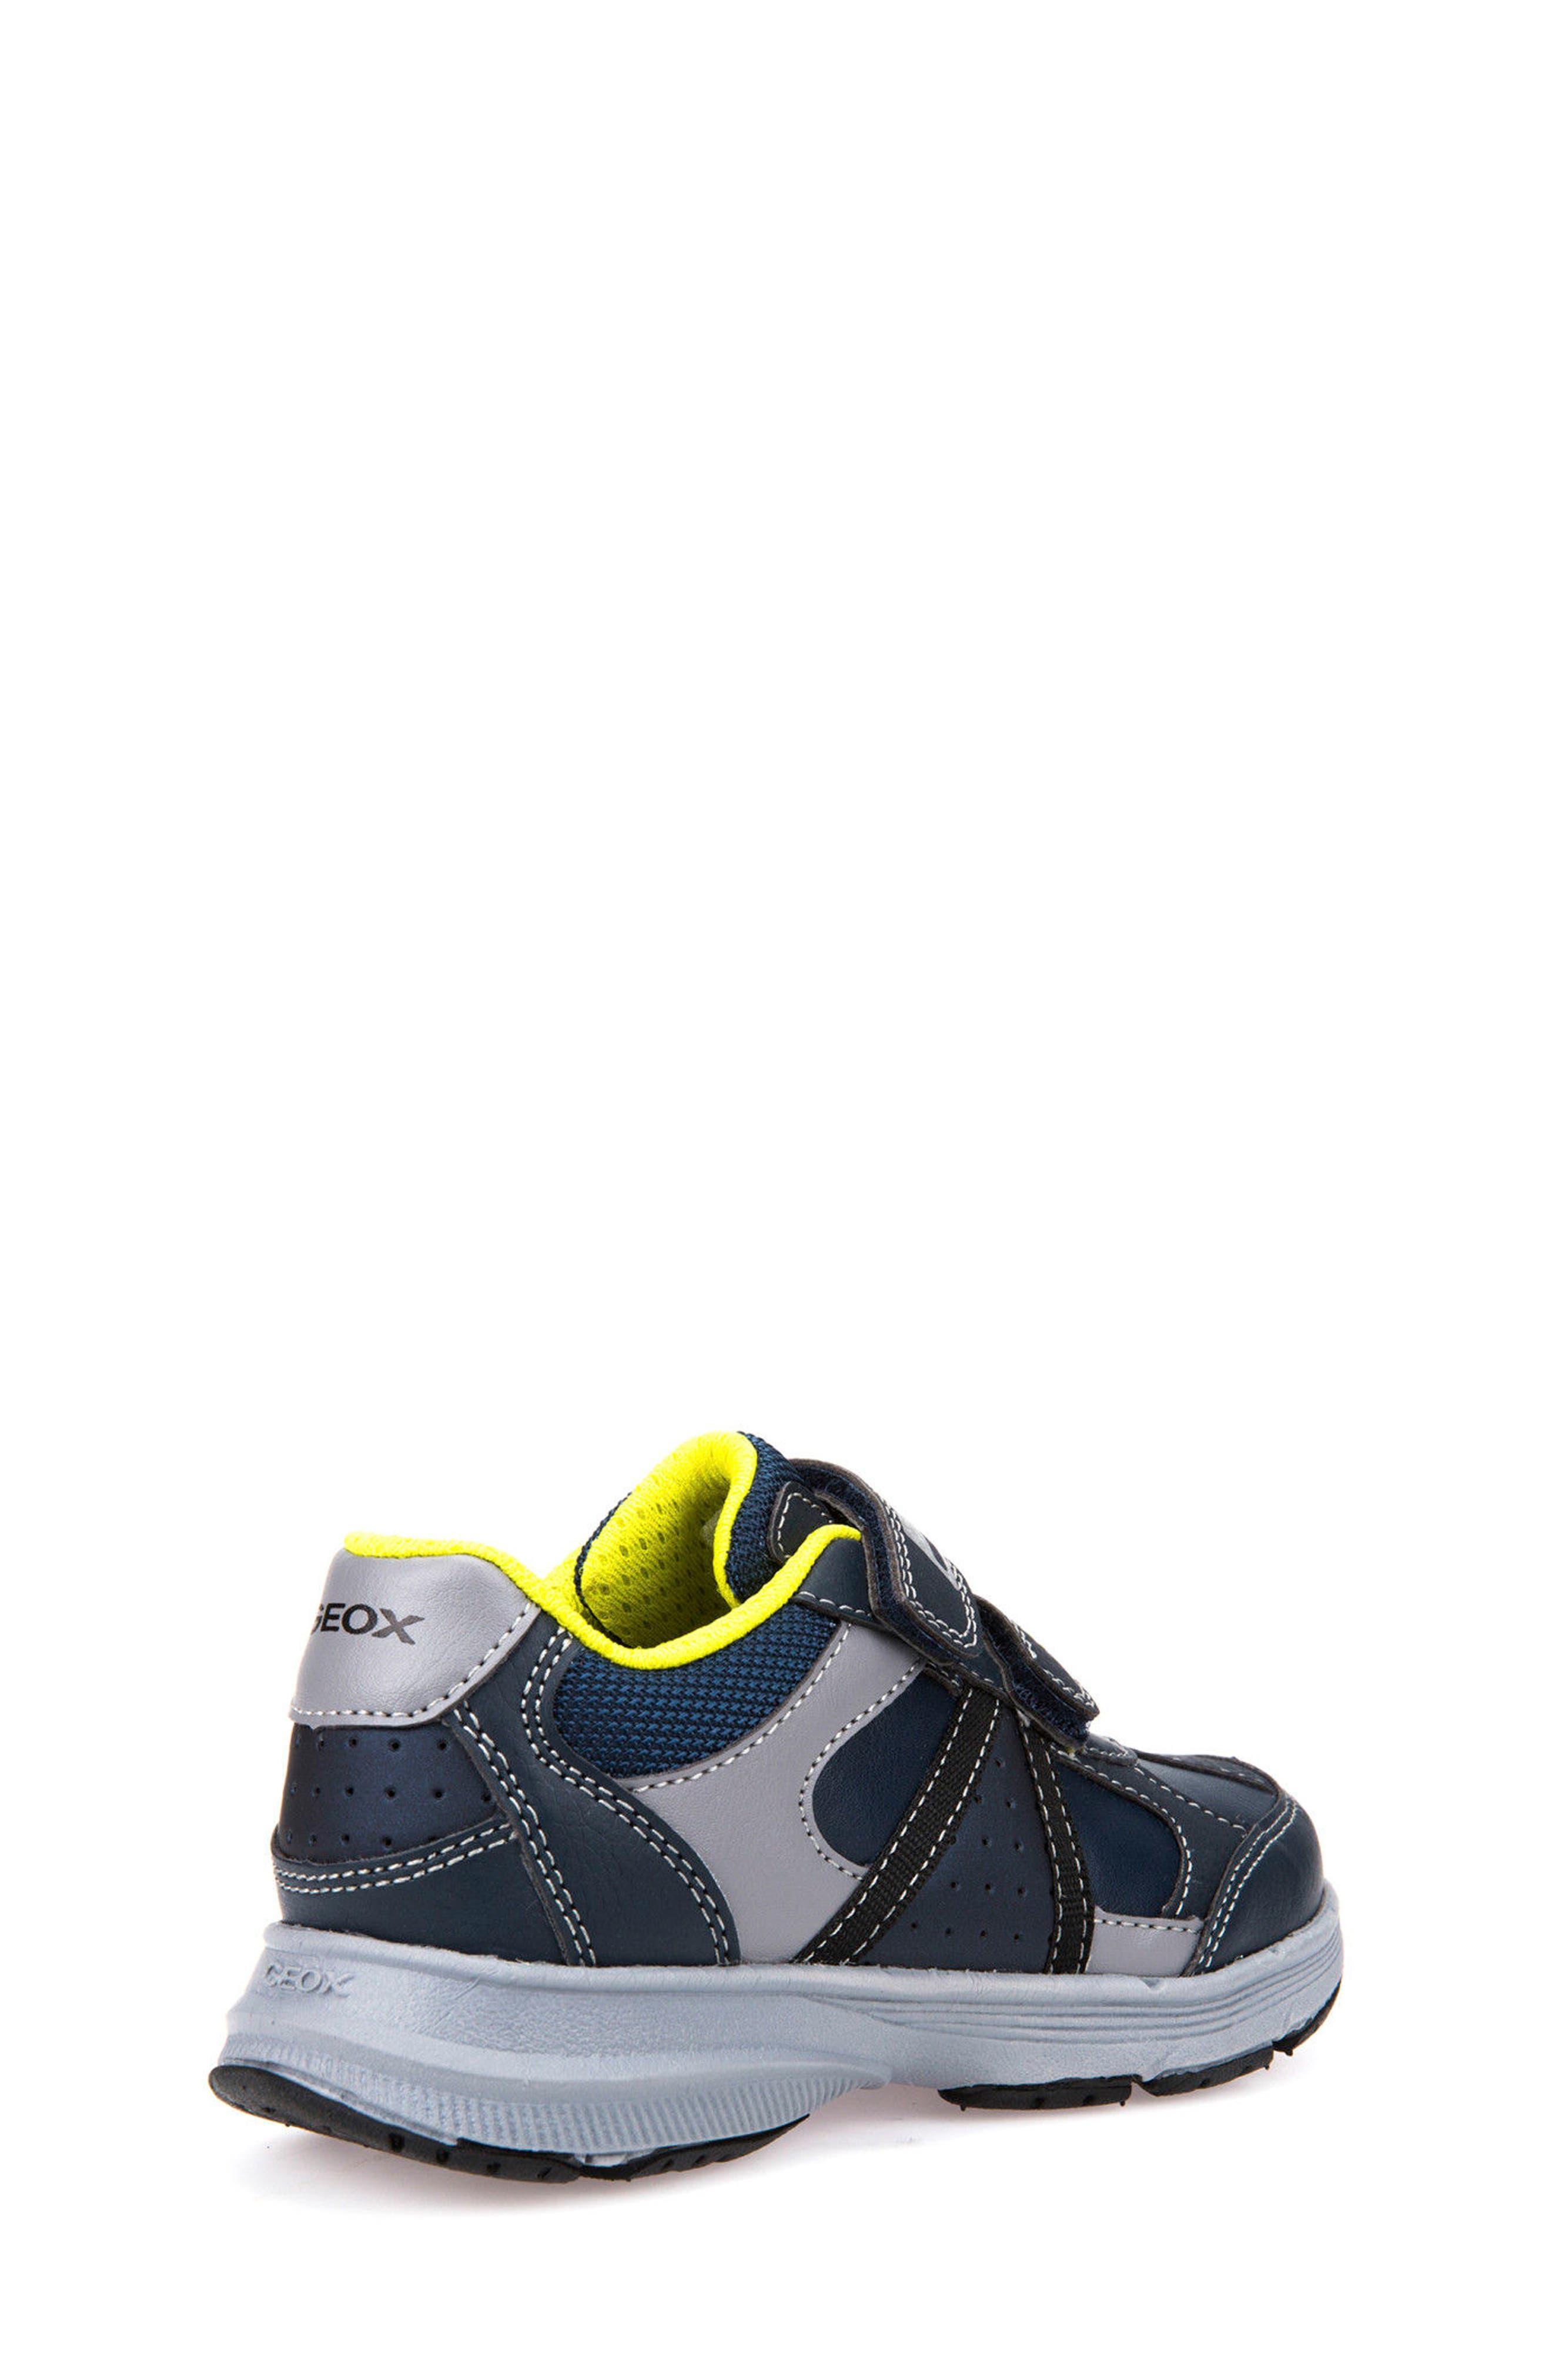 Top Fly Sneaker,                             Alternate thumbnail 7, color,                             Navy